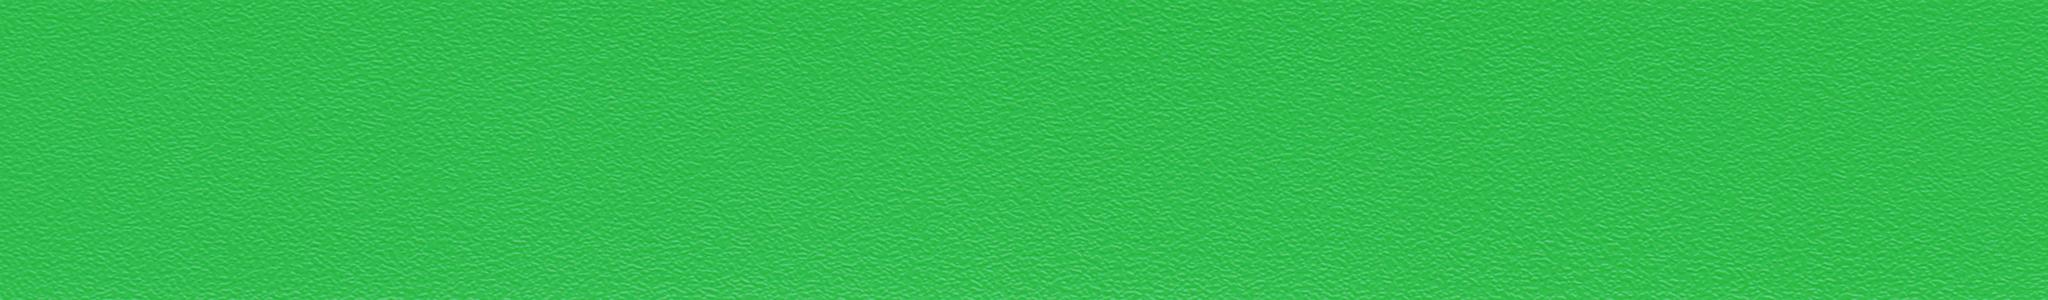 HU 16600 ABS hrana zelená perla XG